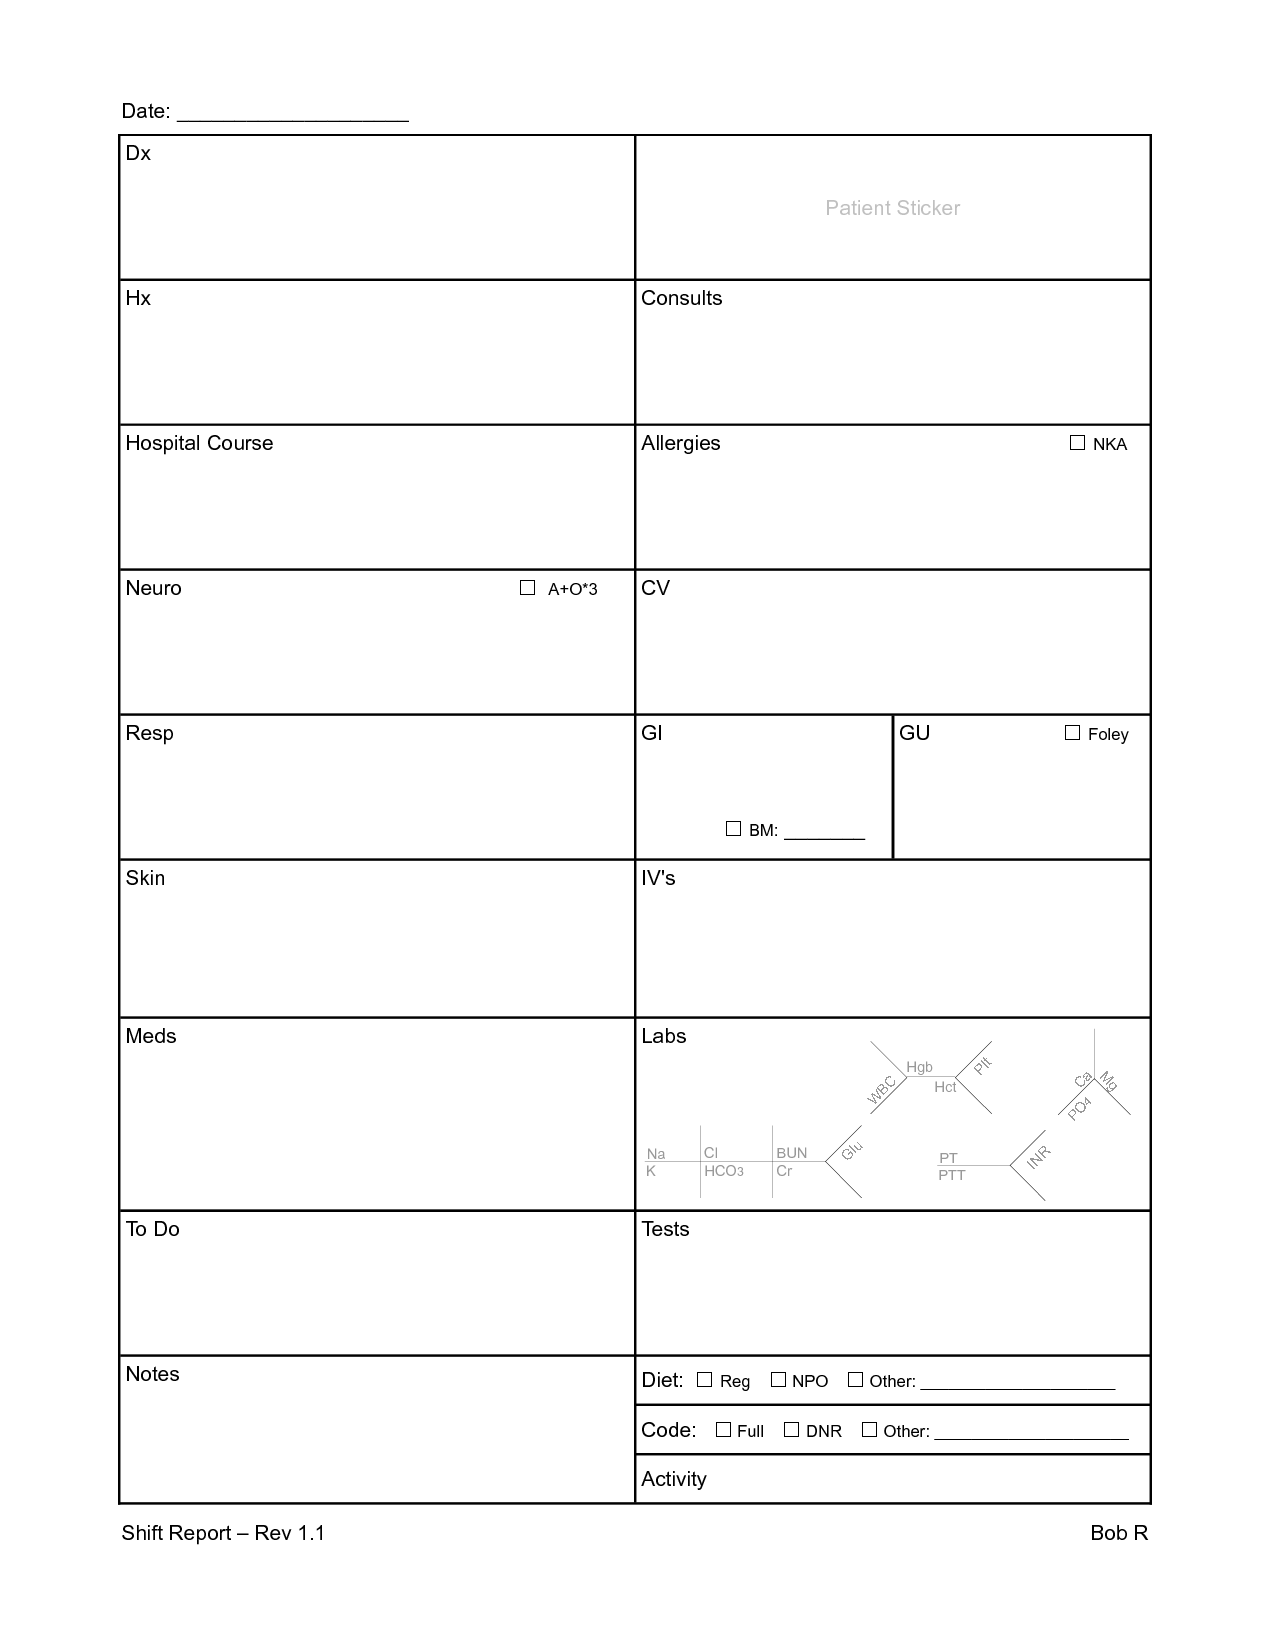 Nurse Shift Report Forms